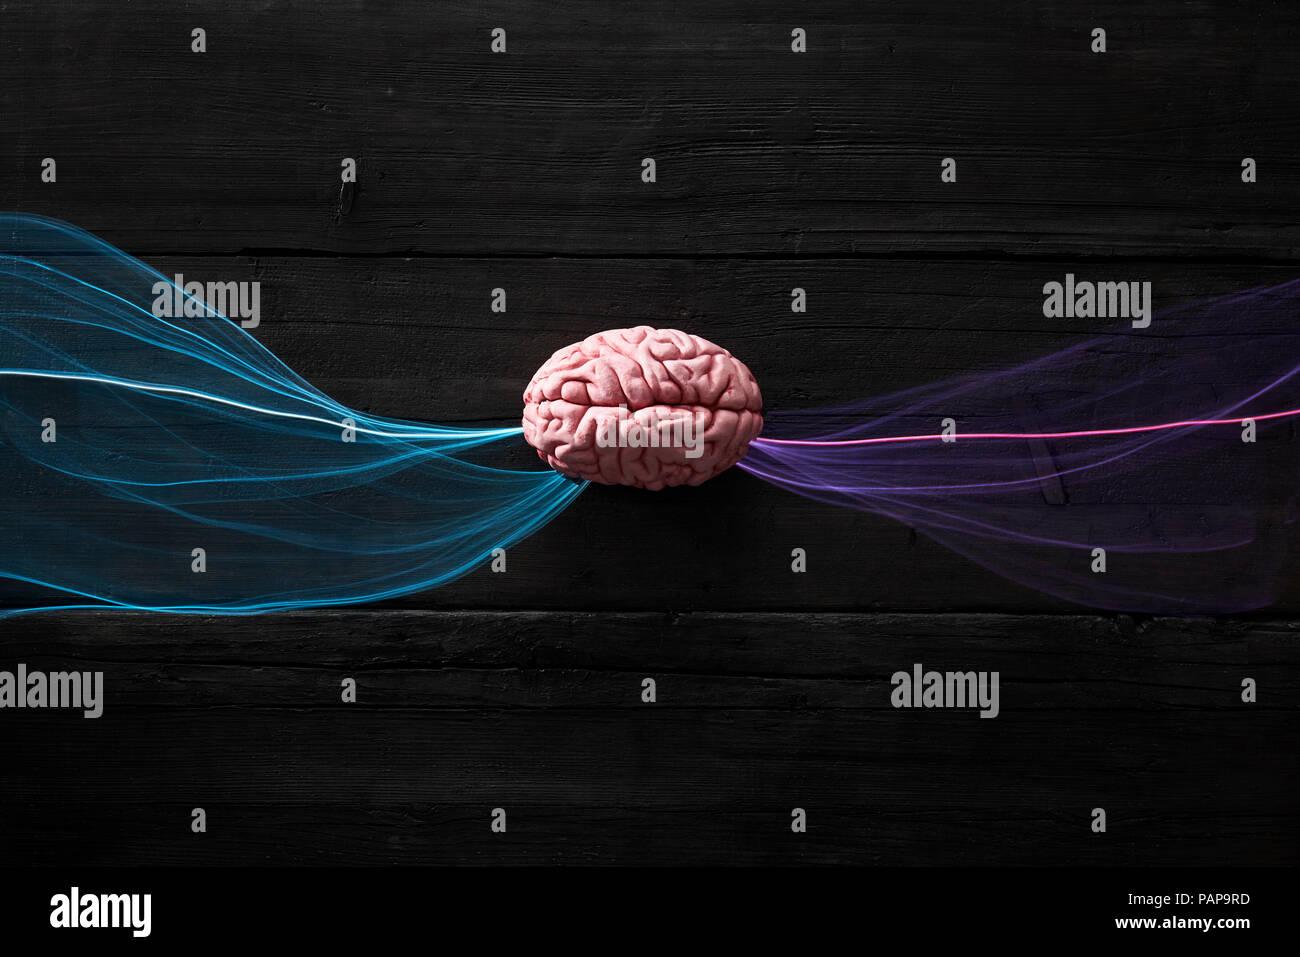 Brain and light waves symbolizing data flow - Stock Image